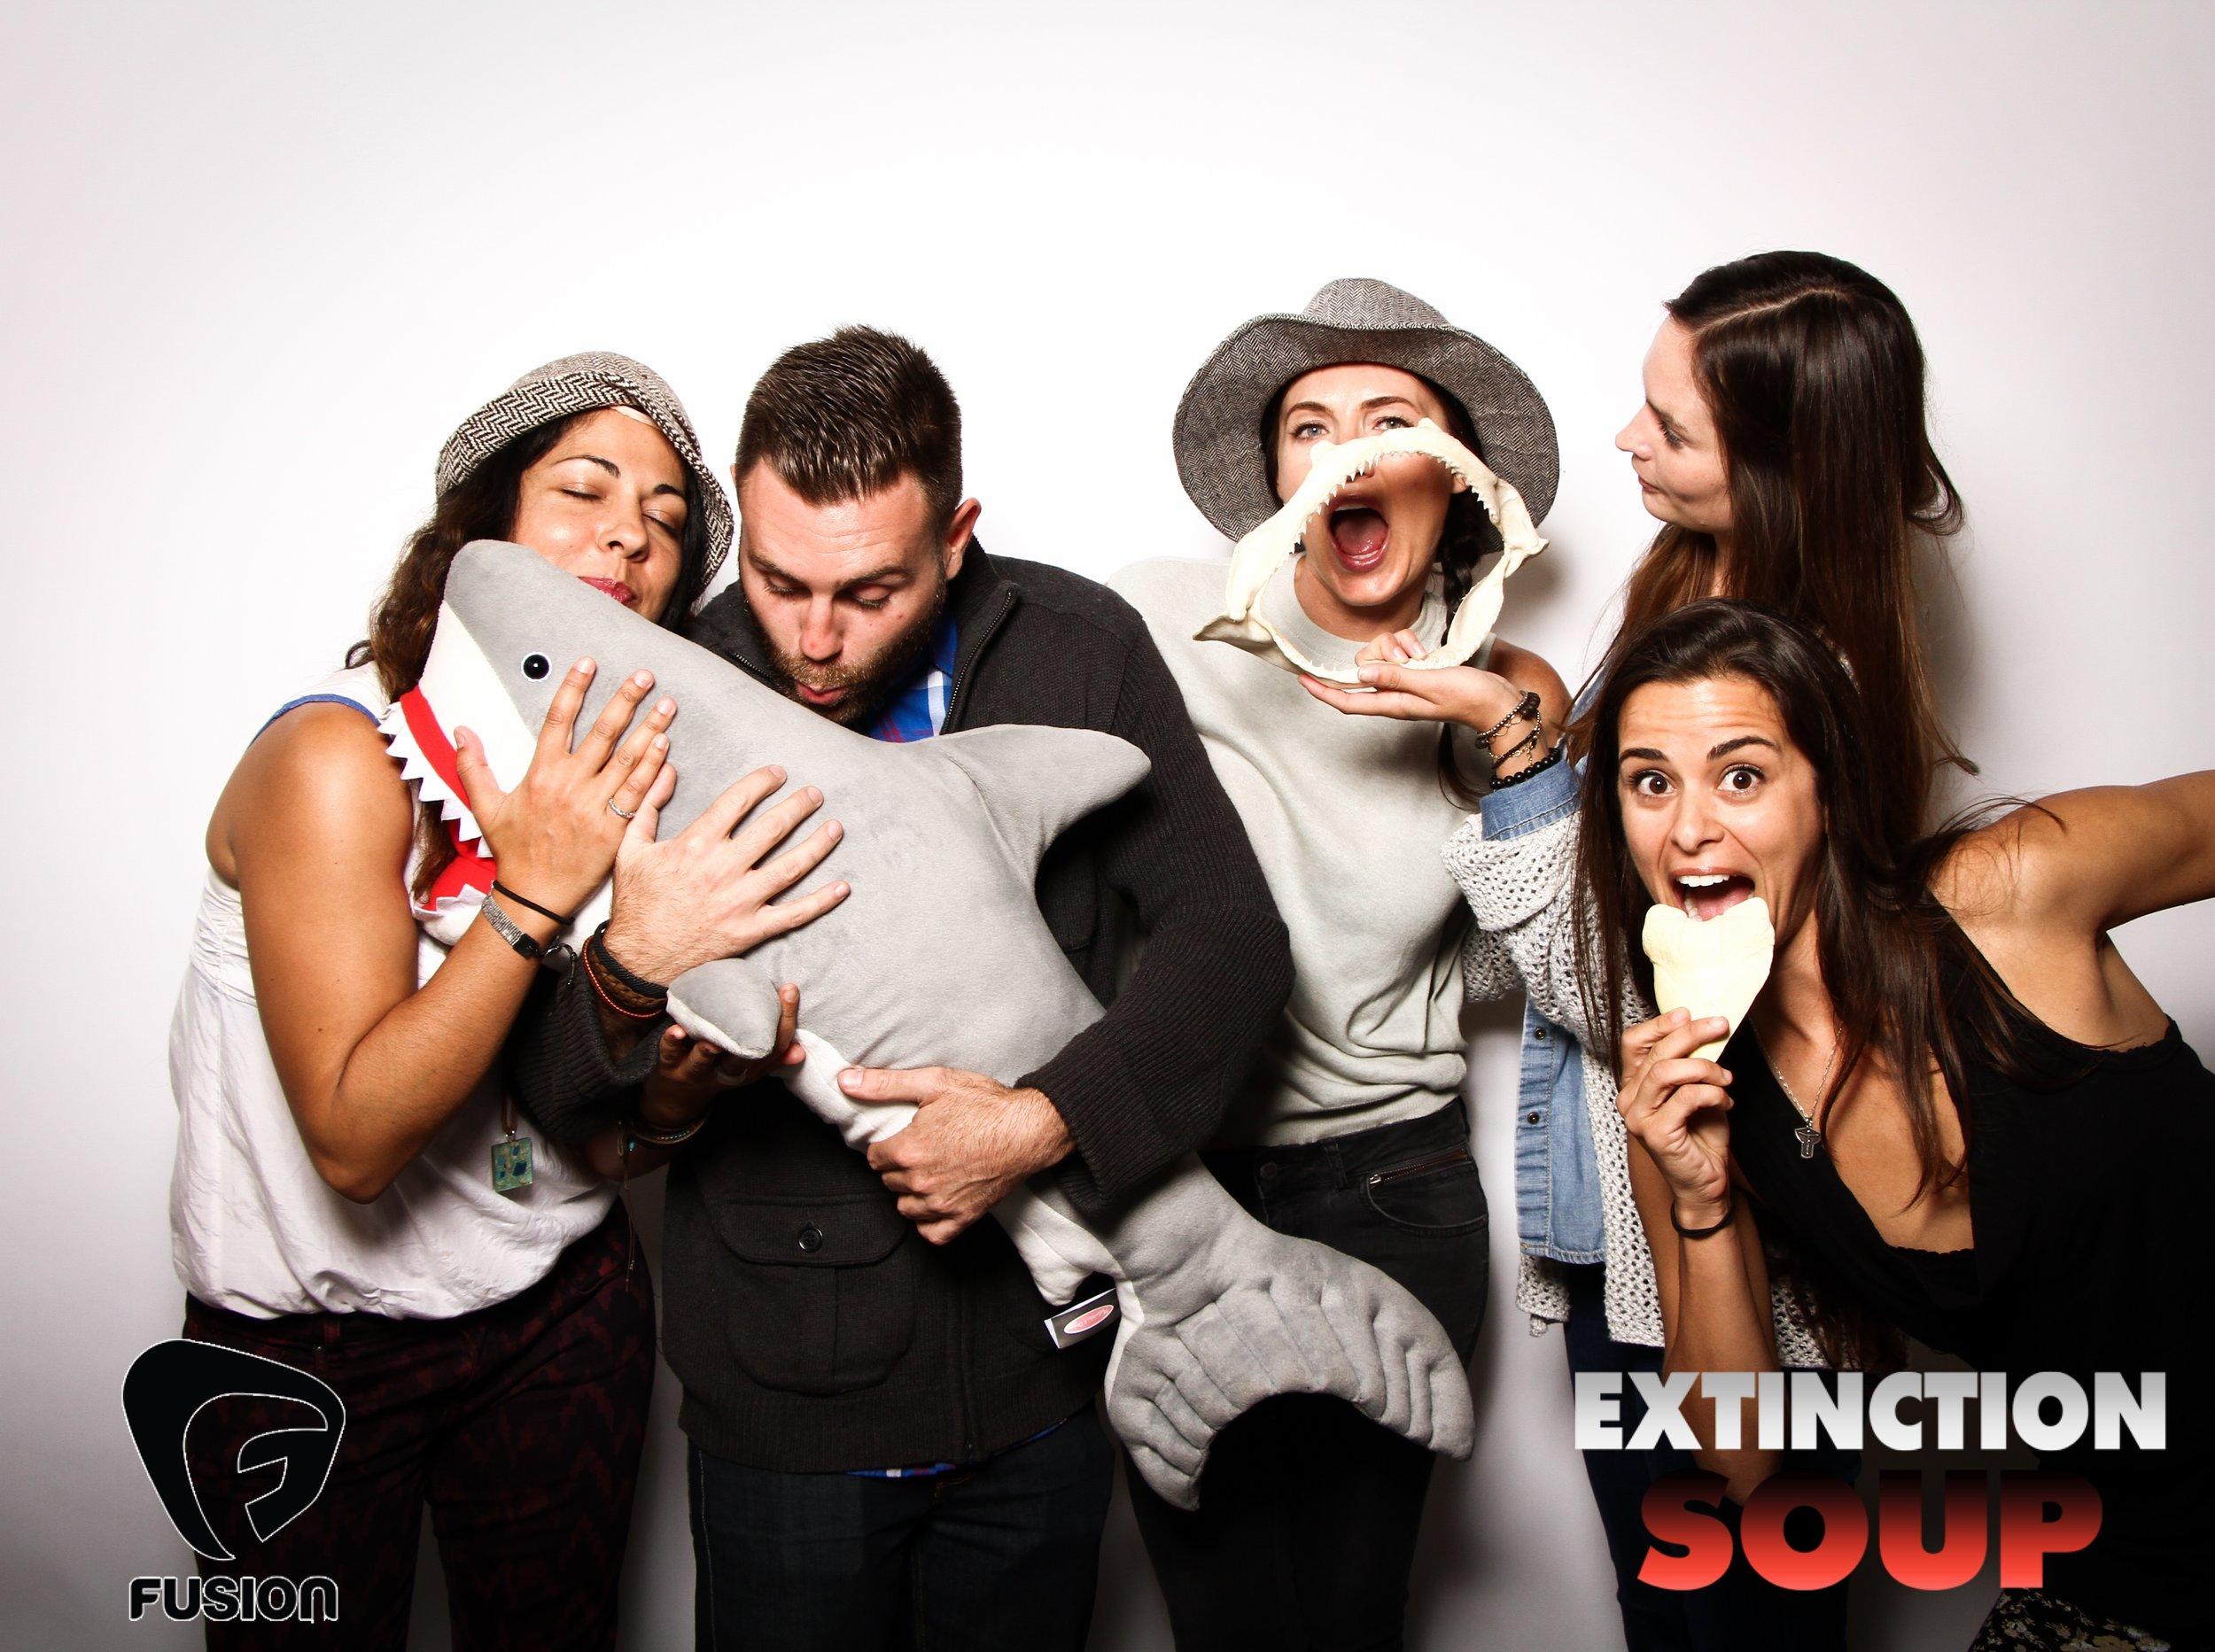 Photo booth fun with shark 5